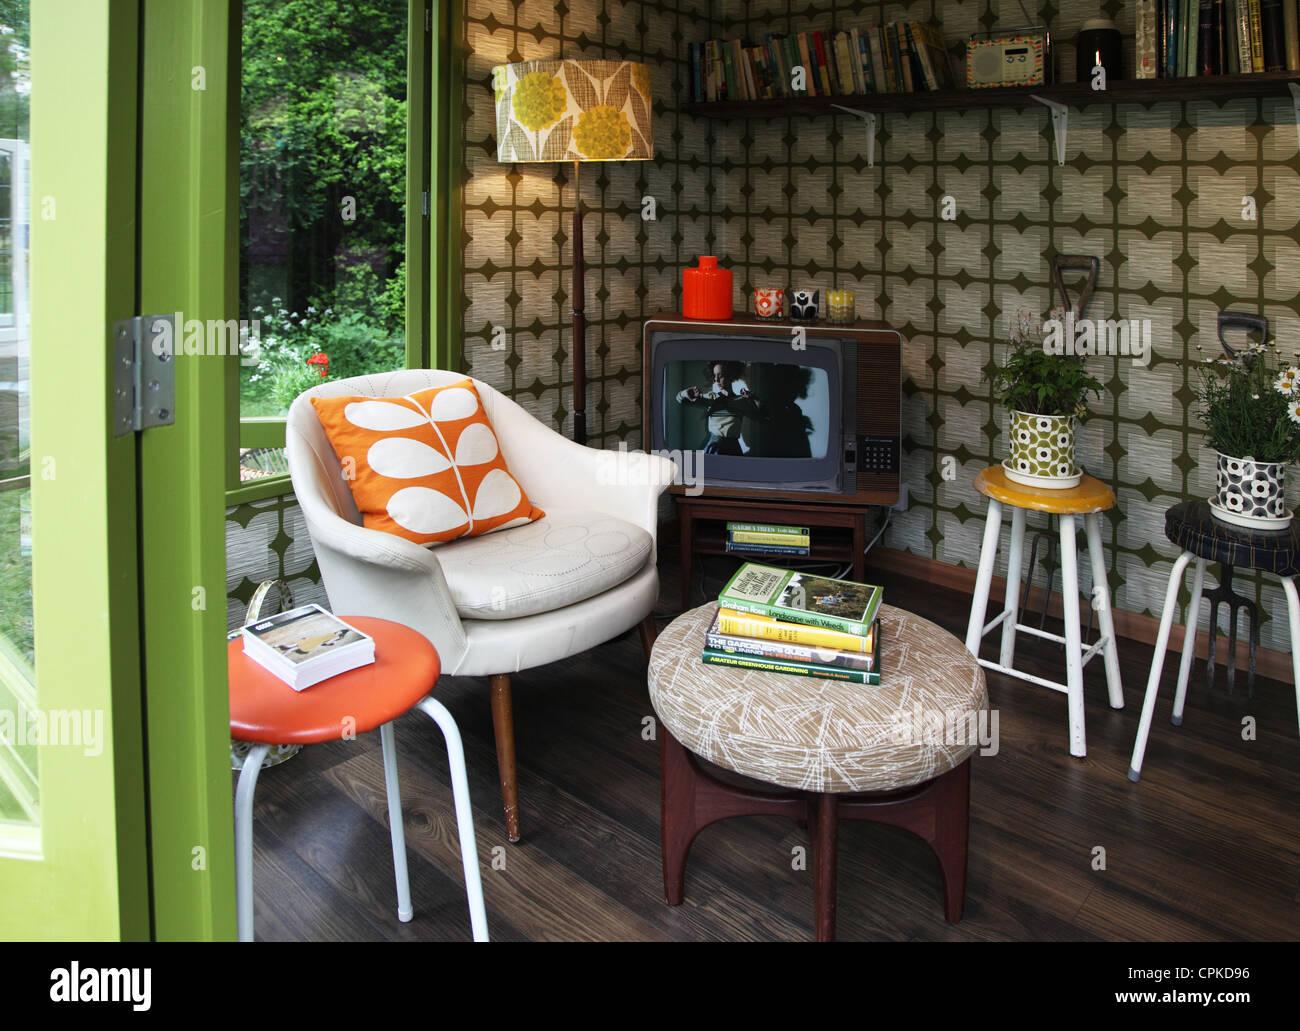 Artisans Retreat Interior By Orla Kiely, RHS Chelsea Flower Show 2012    Stock Image